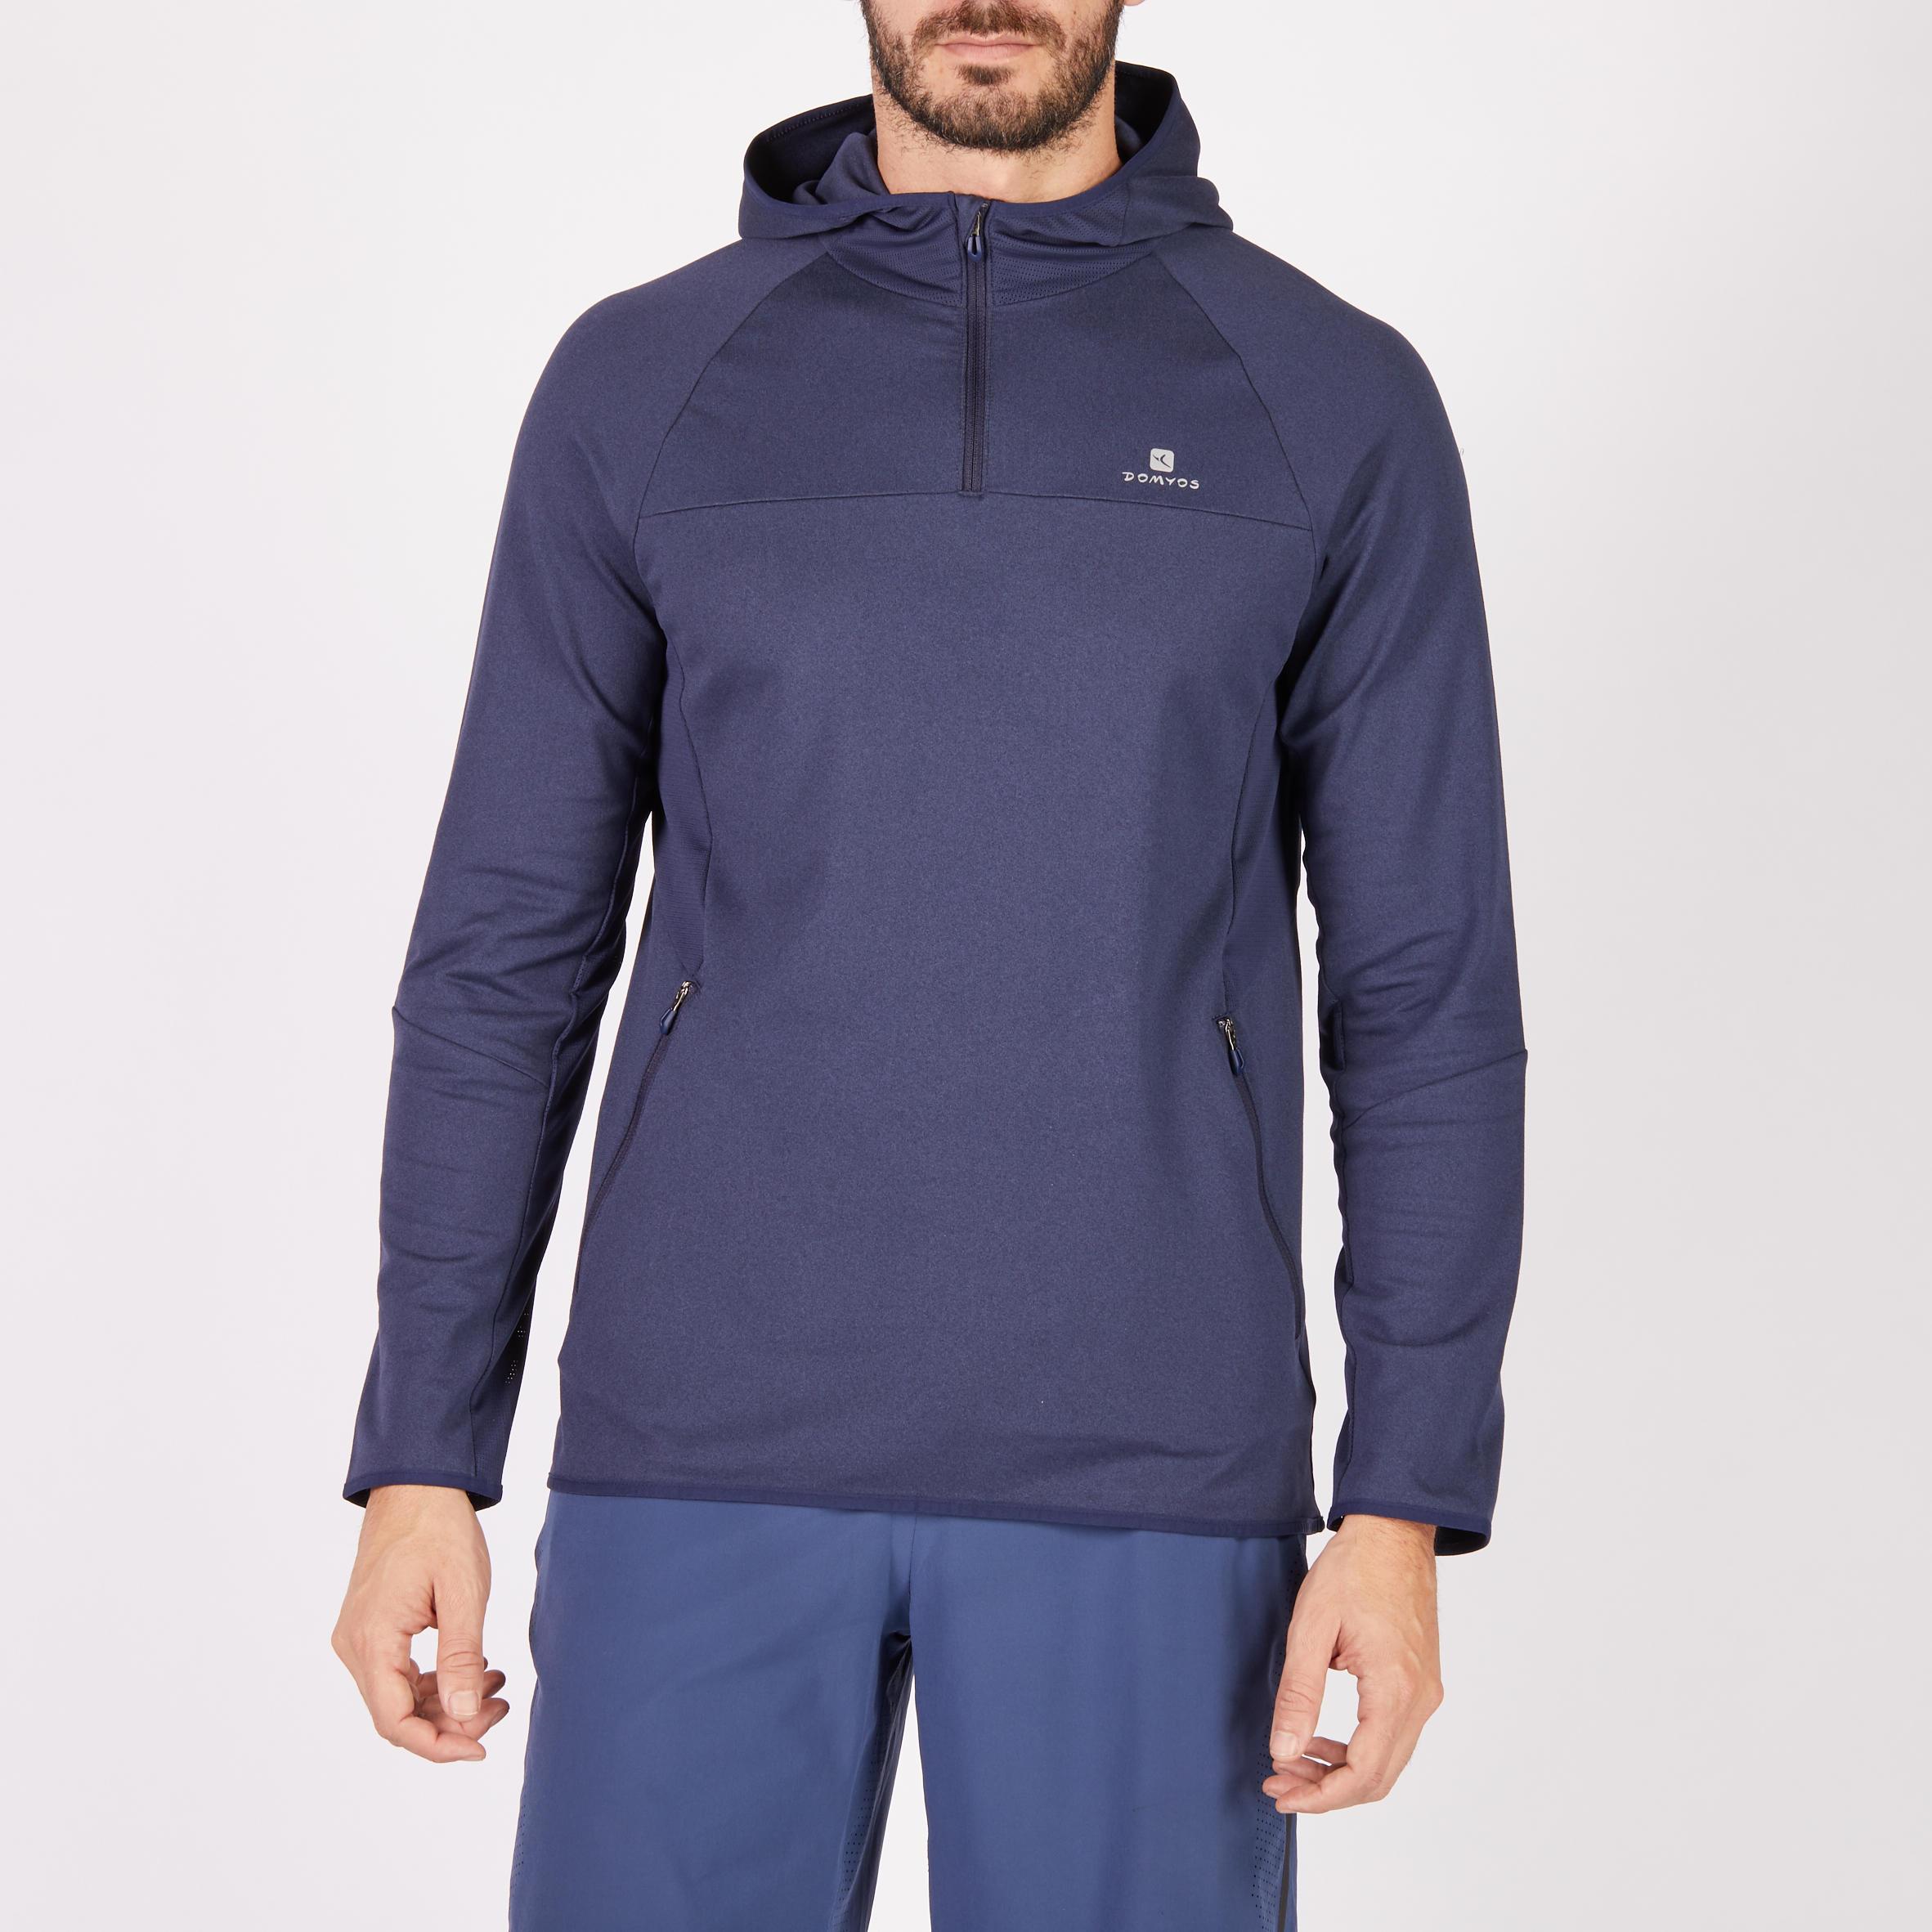 Domyos Sweater fitness-cardio FSW500 heren blauw